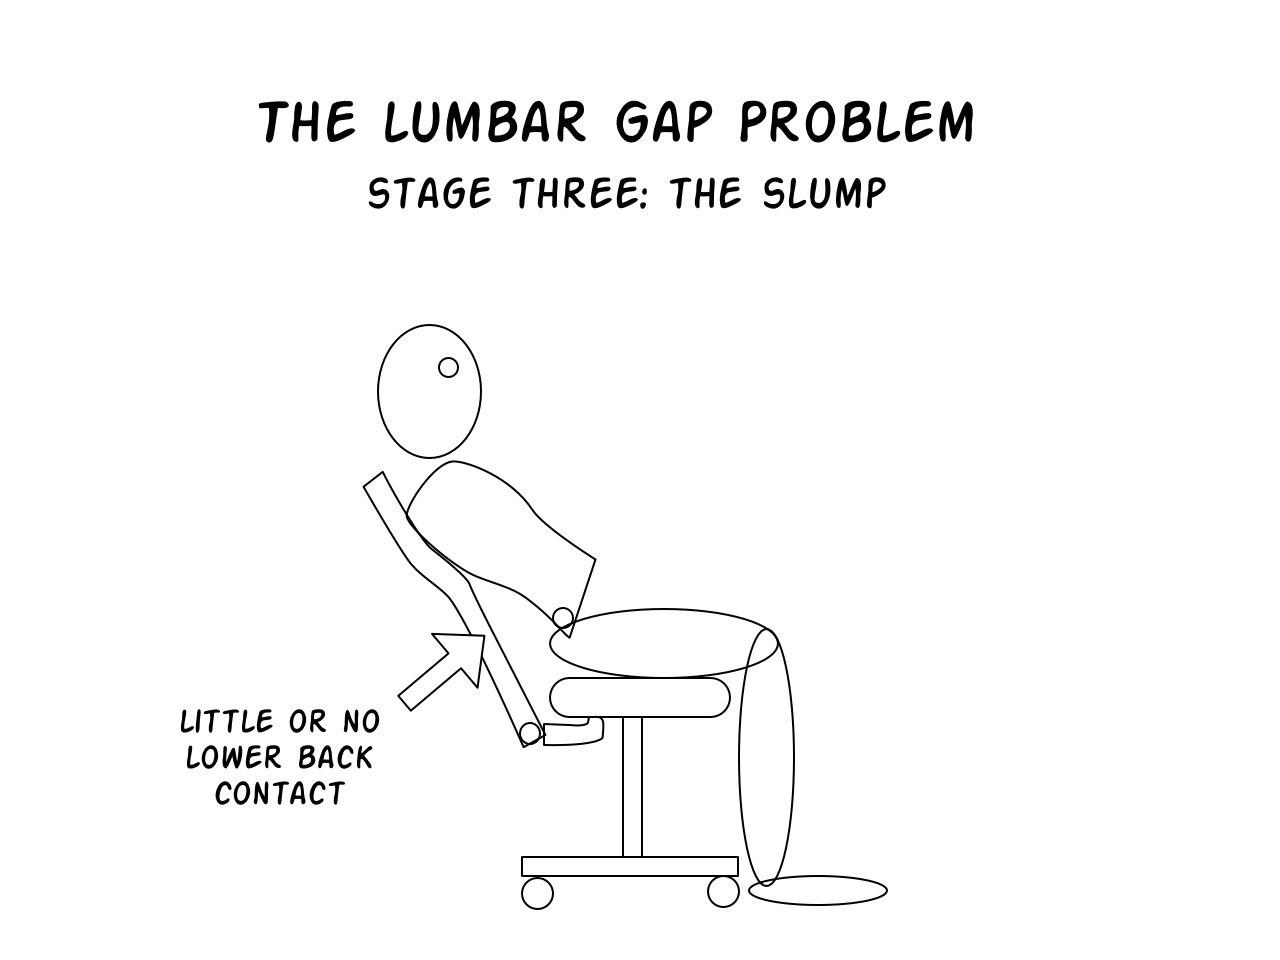 Lumbar Gap Problem stage 3